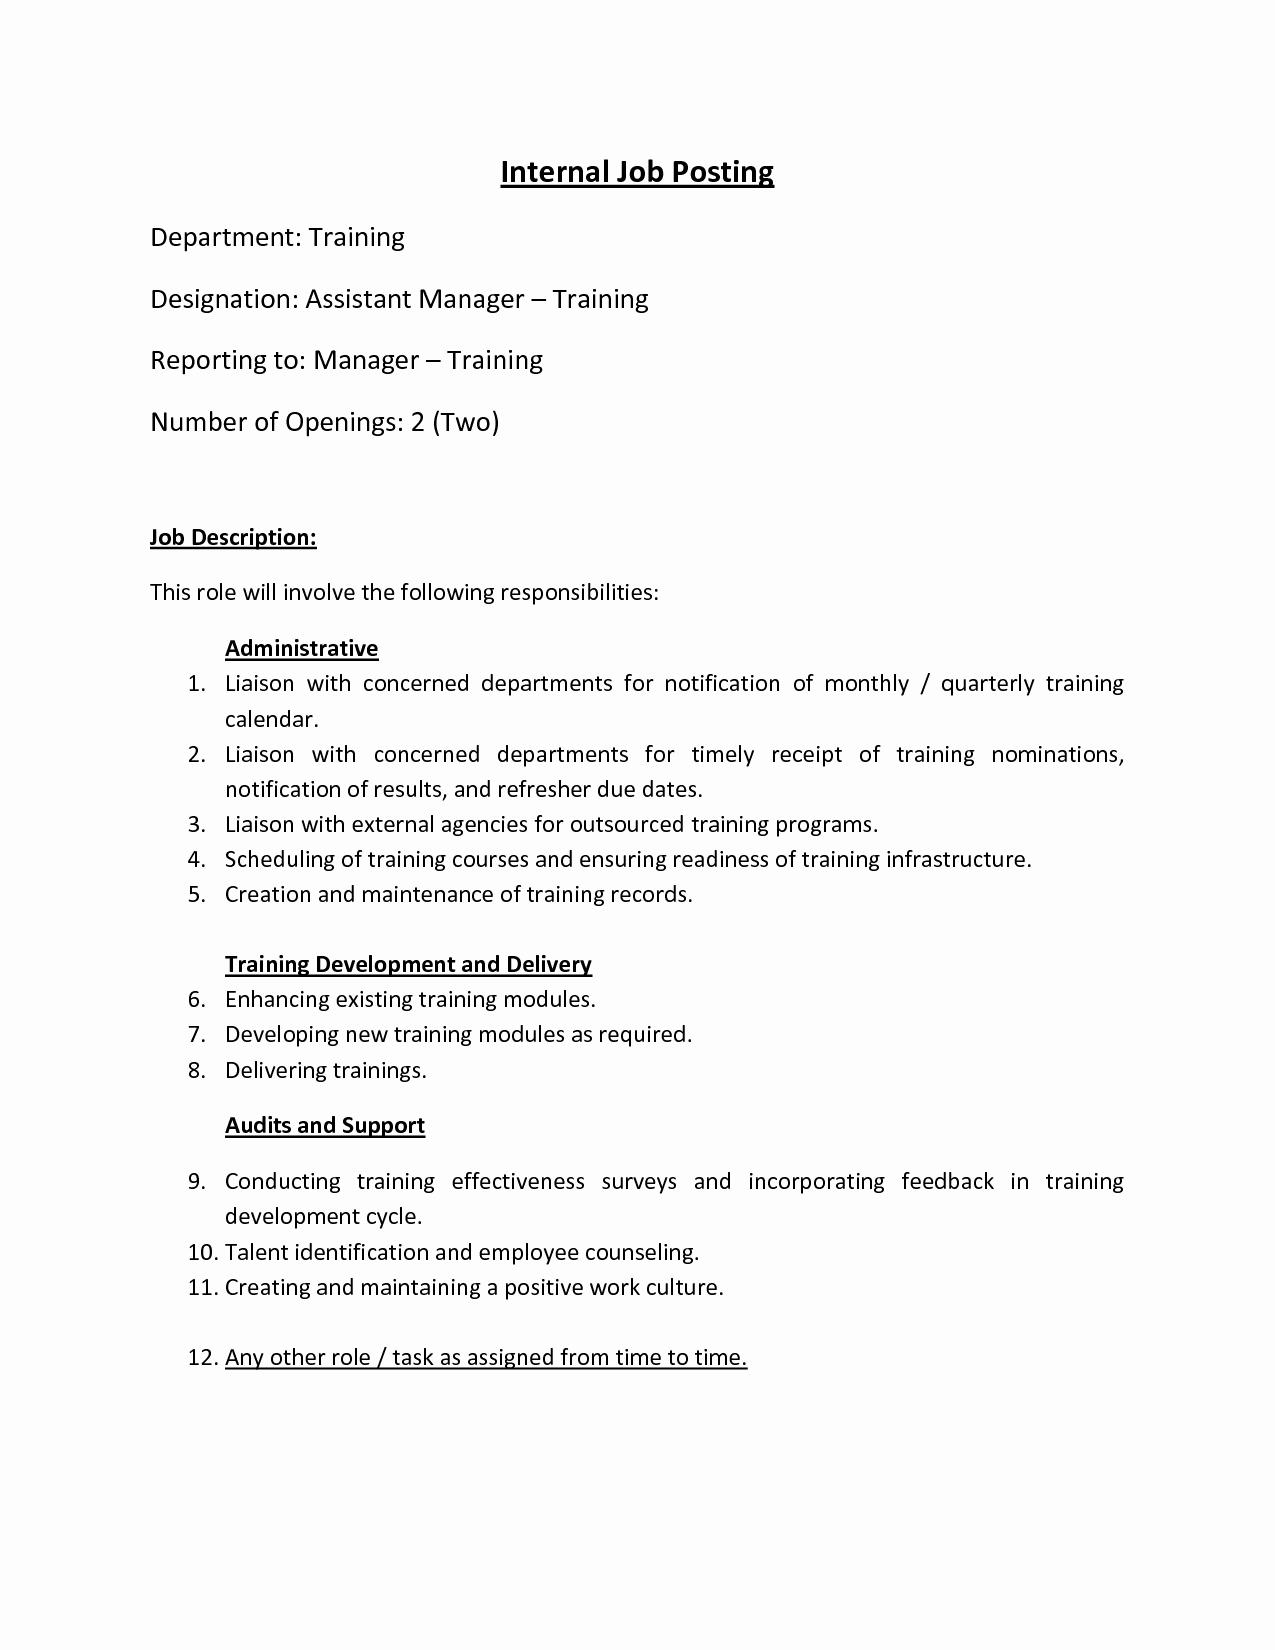 Job Posting Examples Lovely Best S Of Sample Internal Job Posting Template